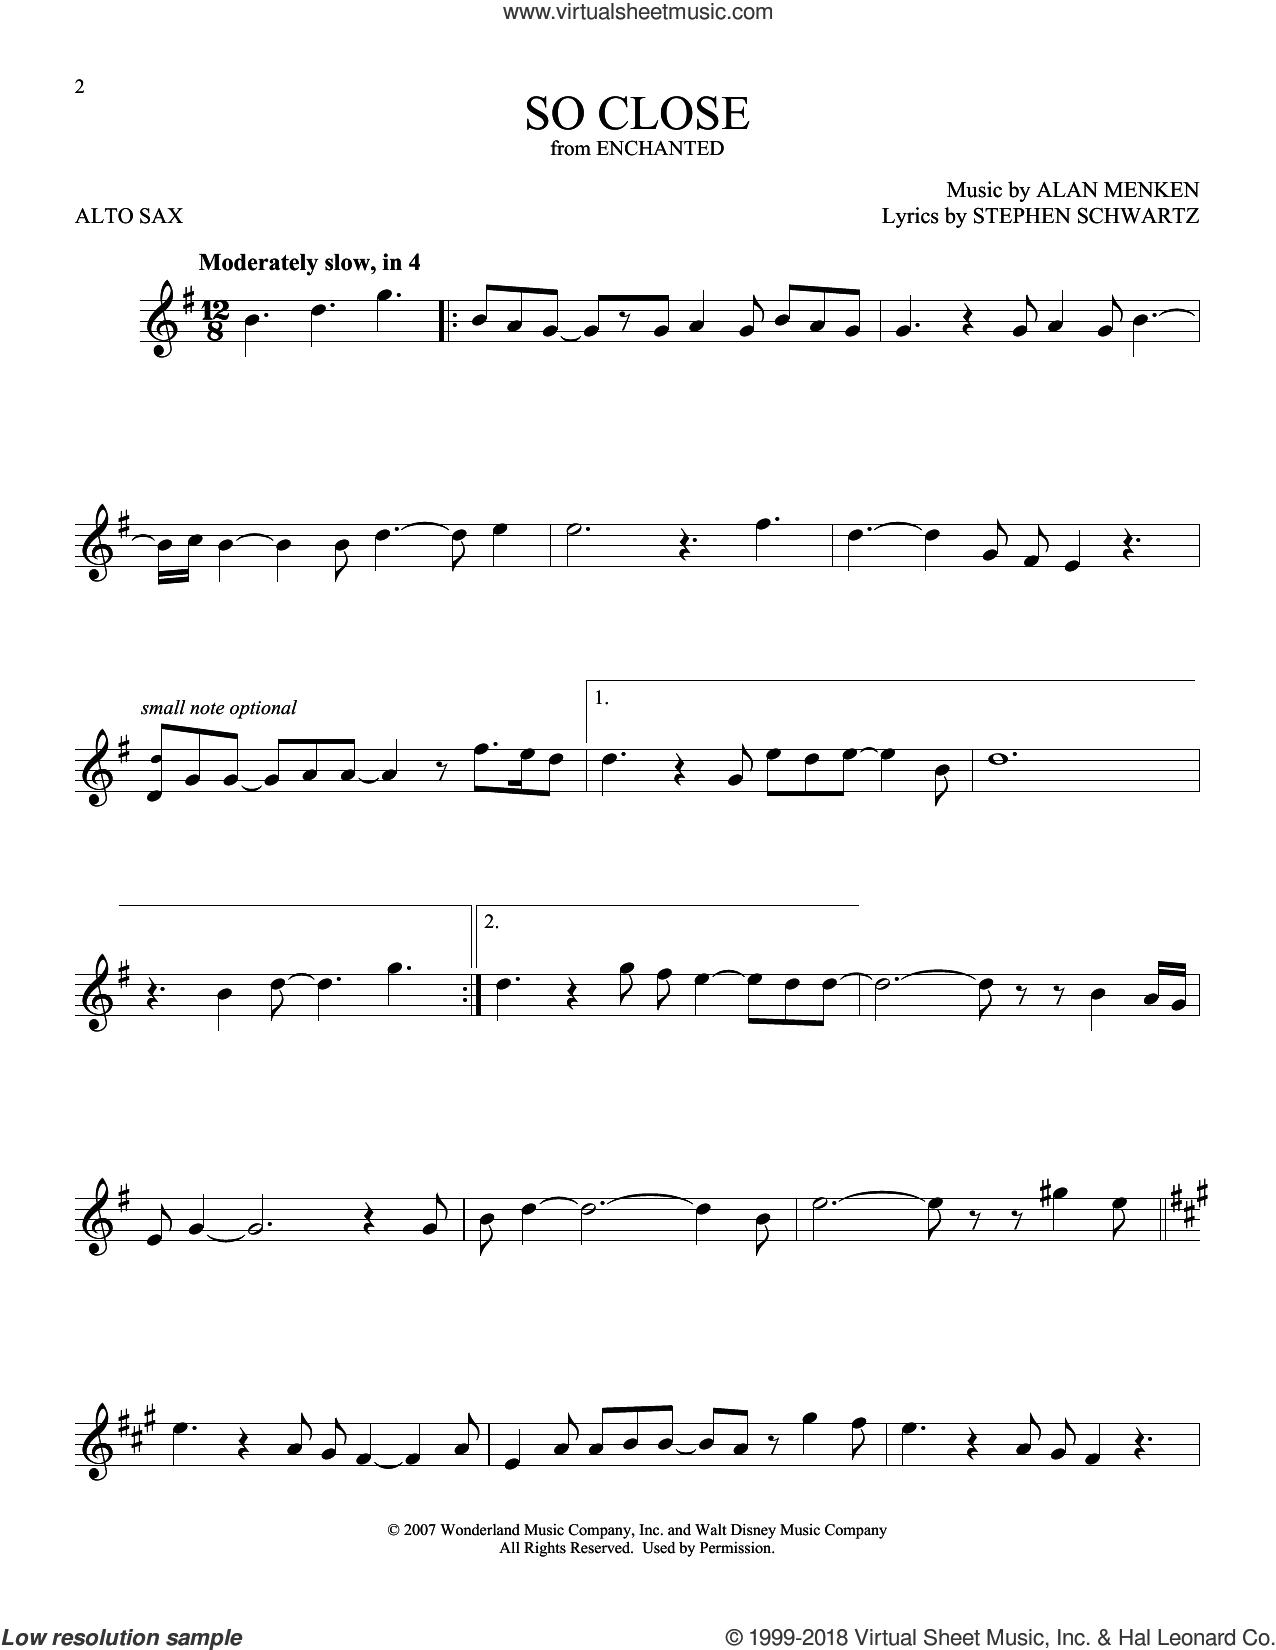 So Close sheet music for alto saxophone solo by Alan Menken and Stephen Schwartz, intermediate skill level